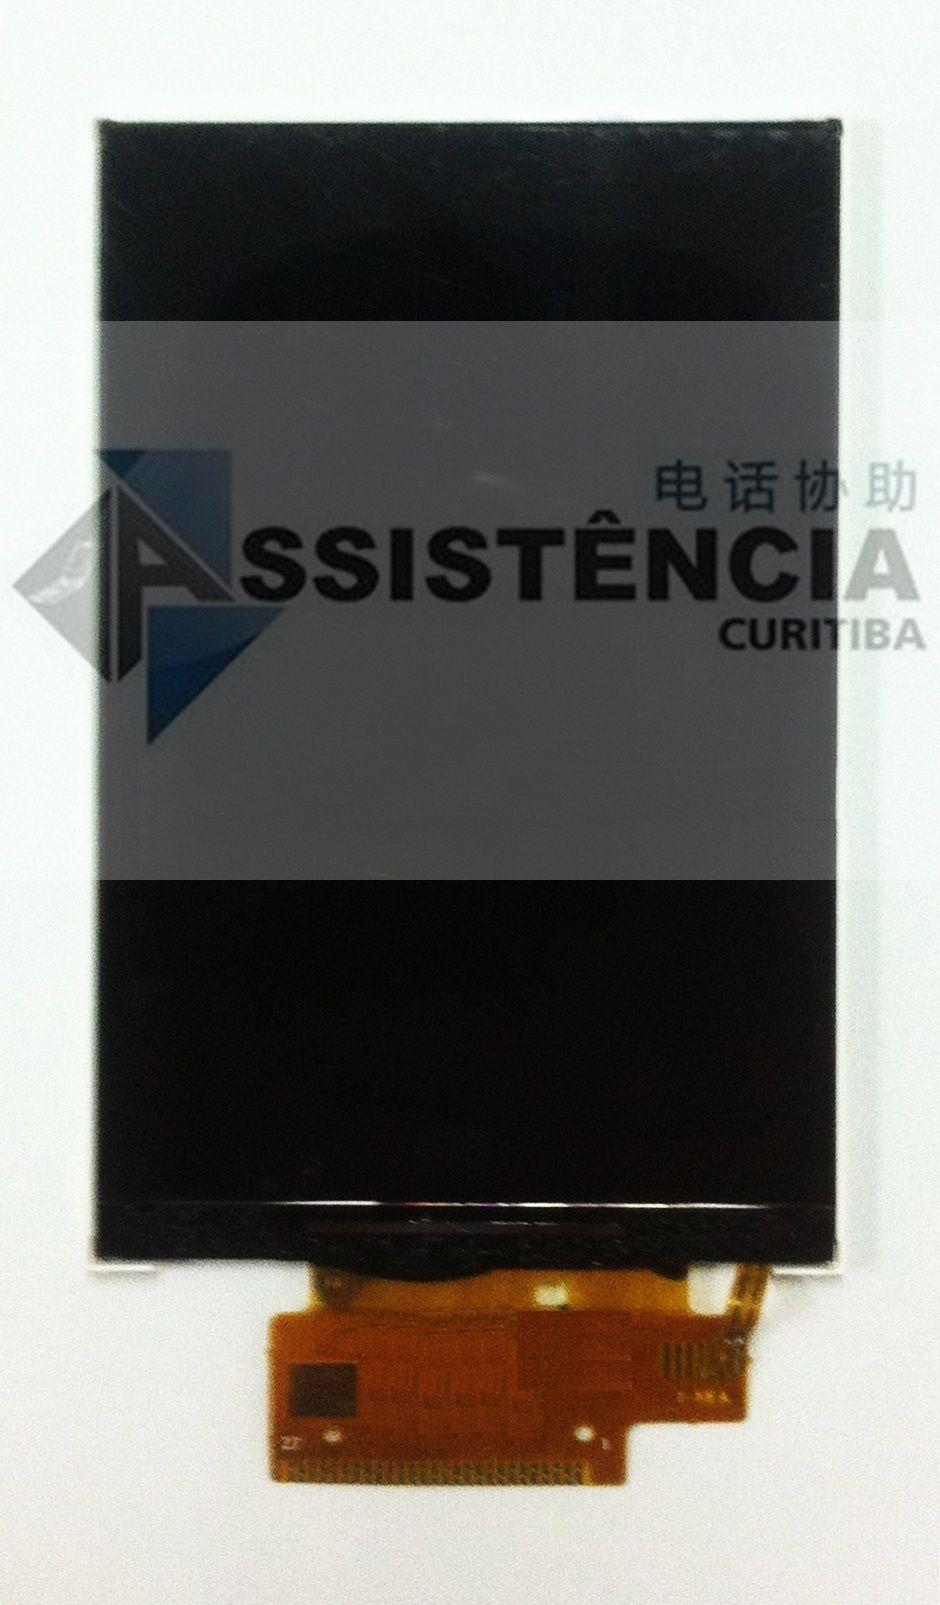 TELA DISPLAY LCD CELULAR ALCATEL PIXI 3 4009 4022d 4023